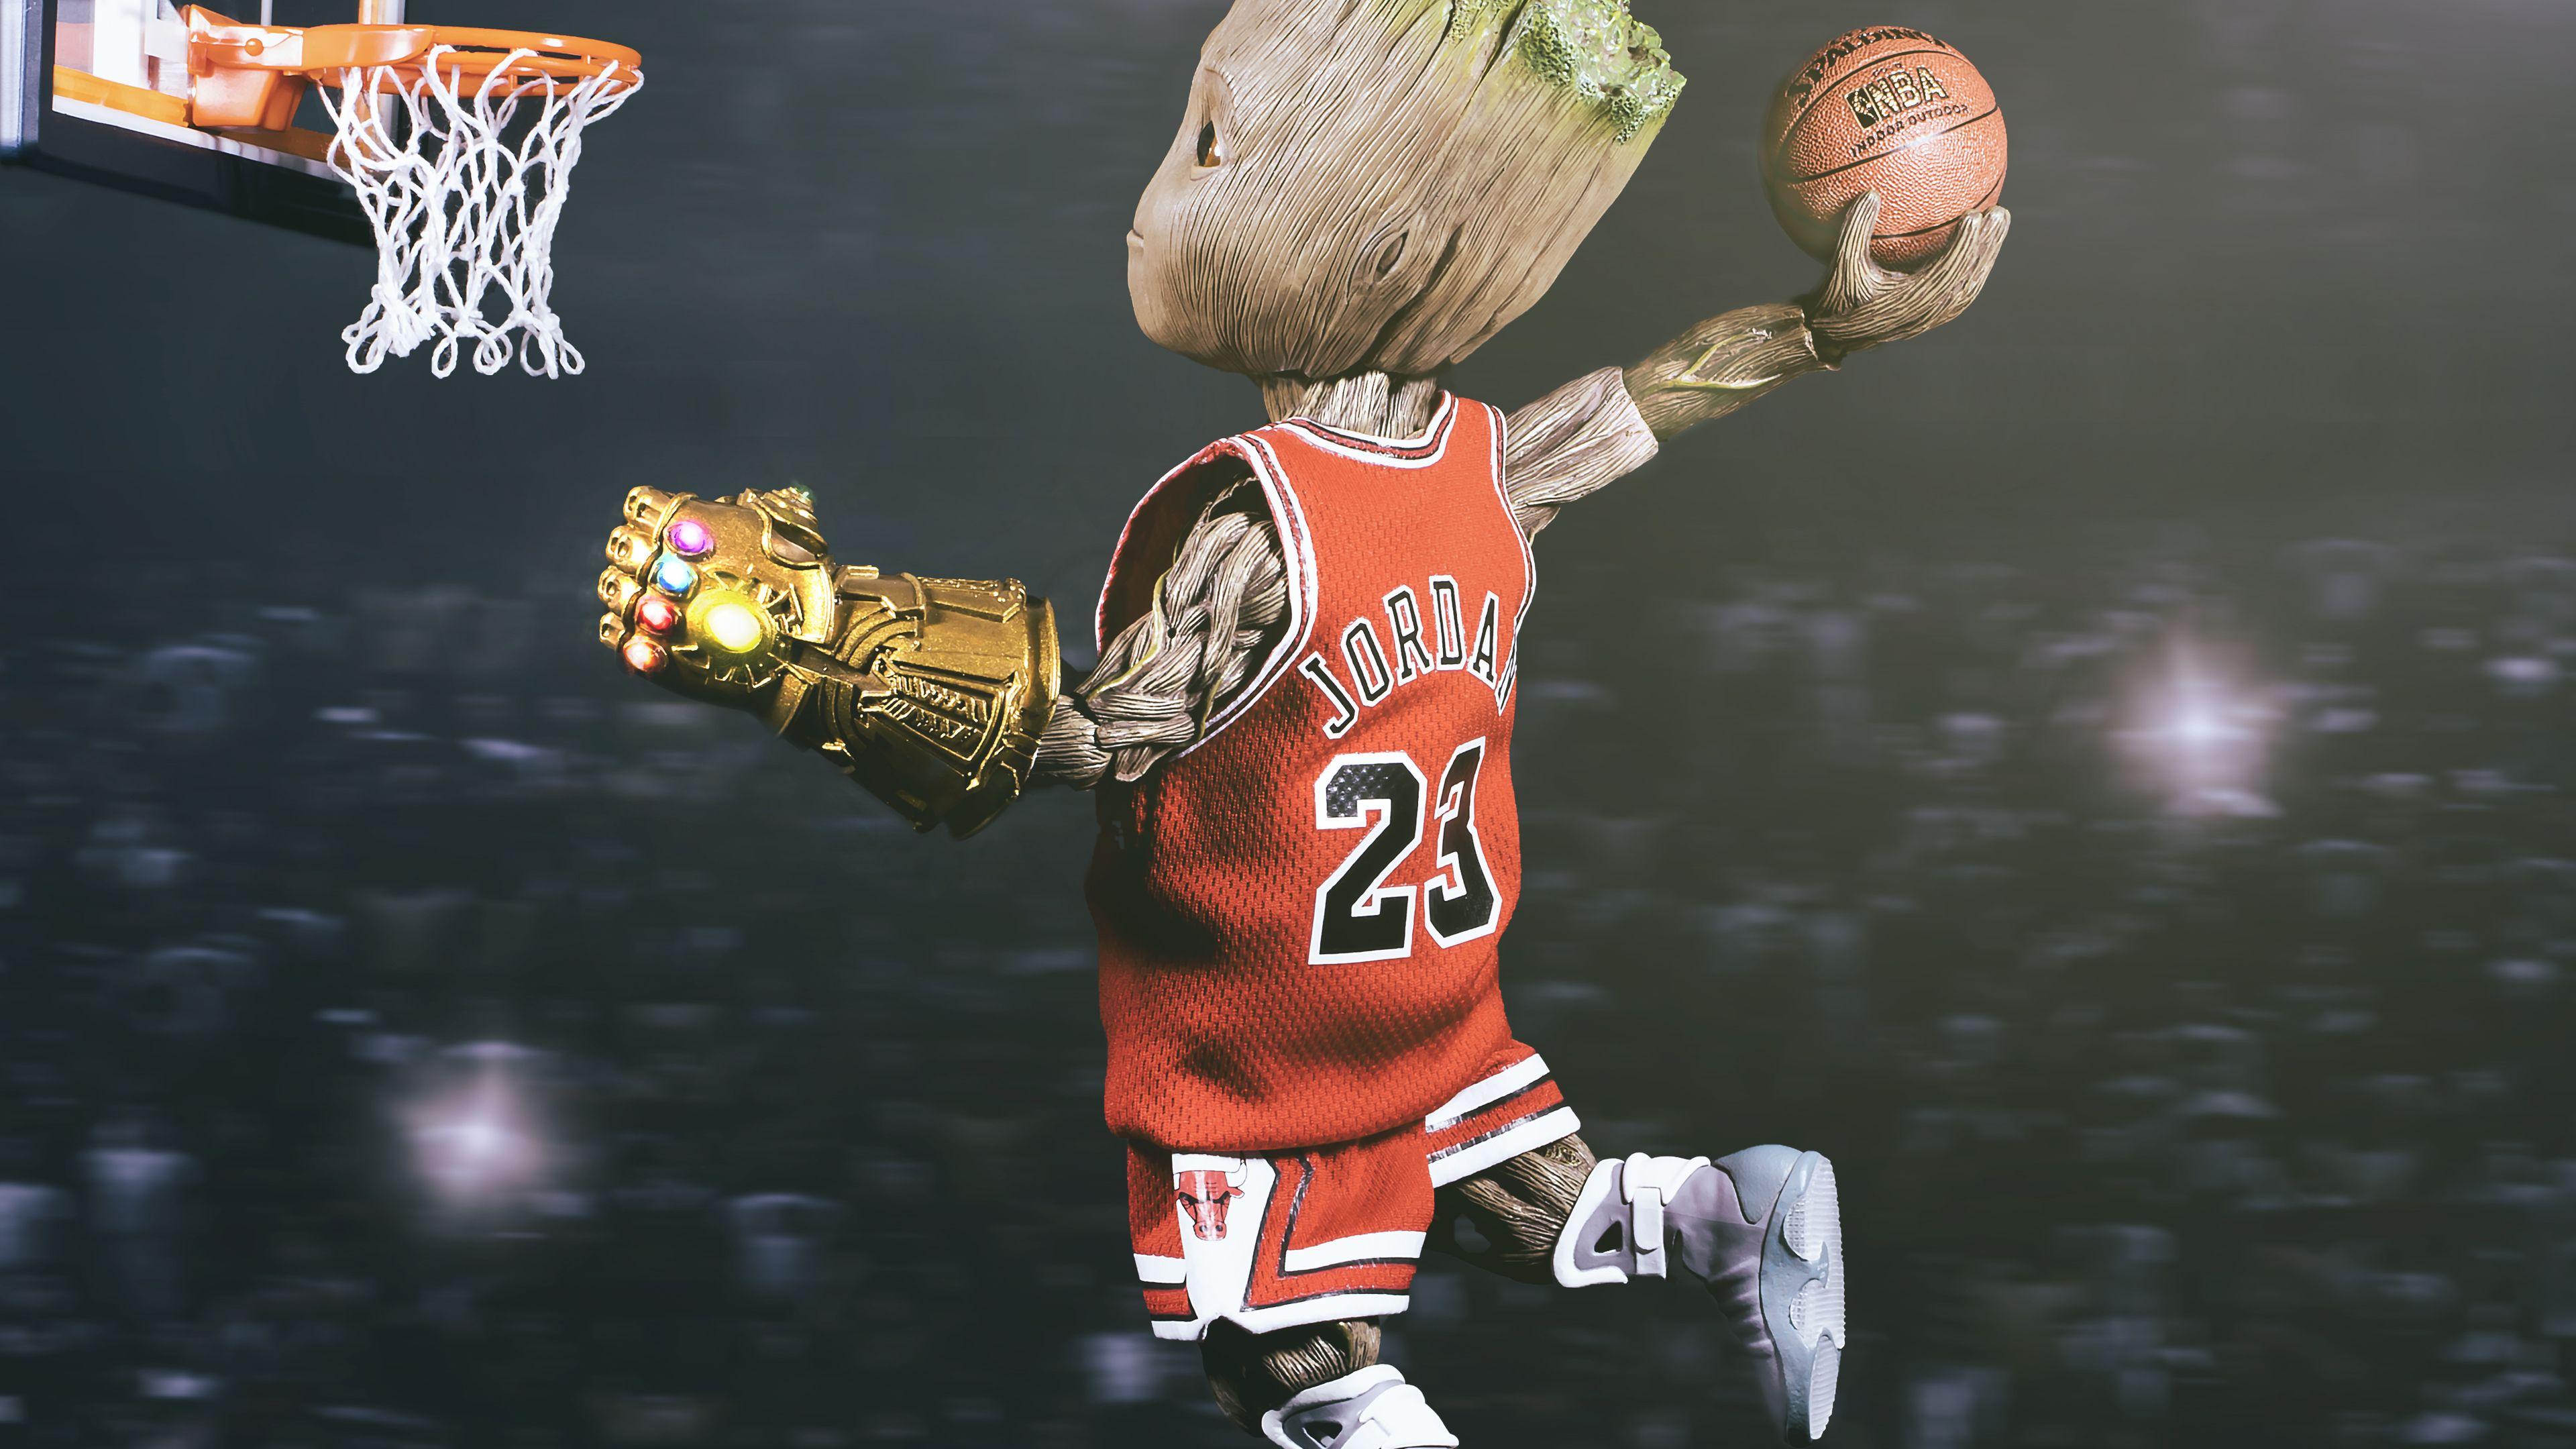 35] 4k Basketball Wallpapers on WallpaperSafari 3840x2160